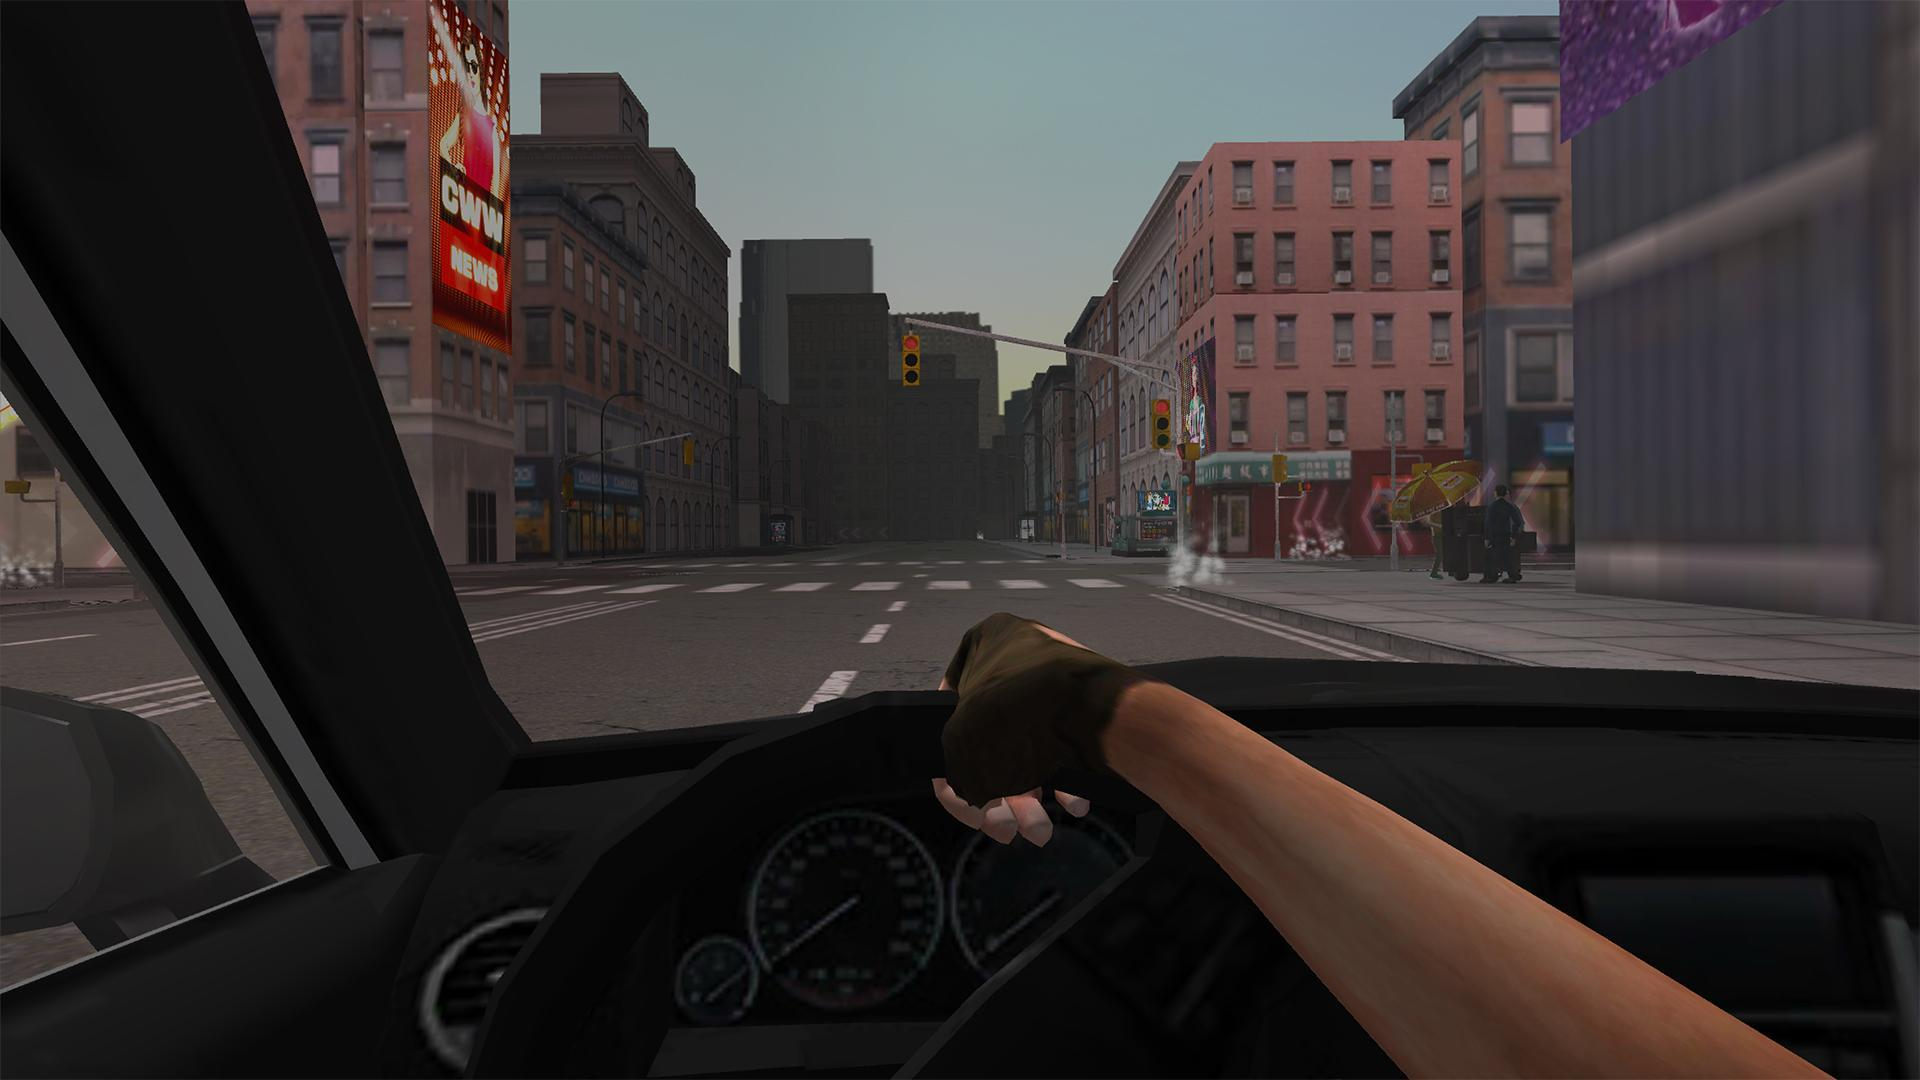 Free city driver 2 games msn slot casino gmbh